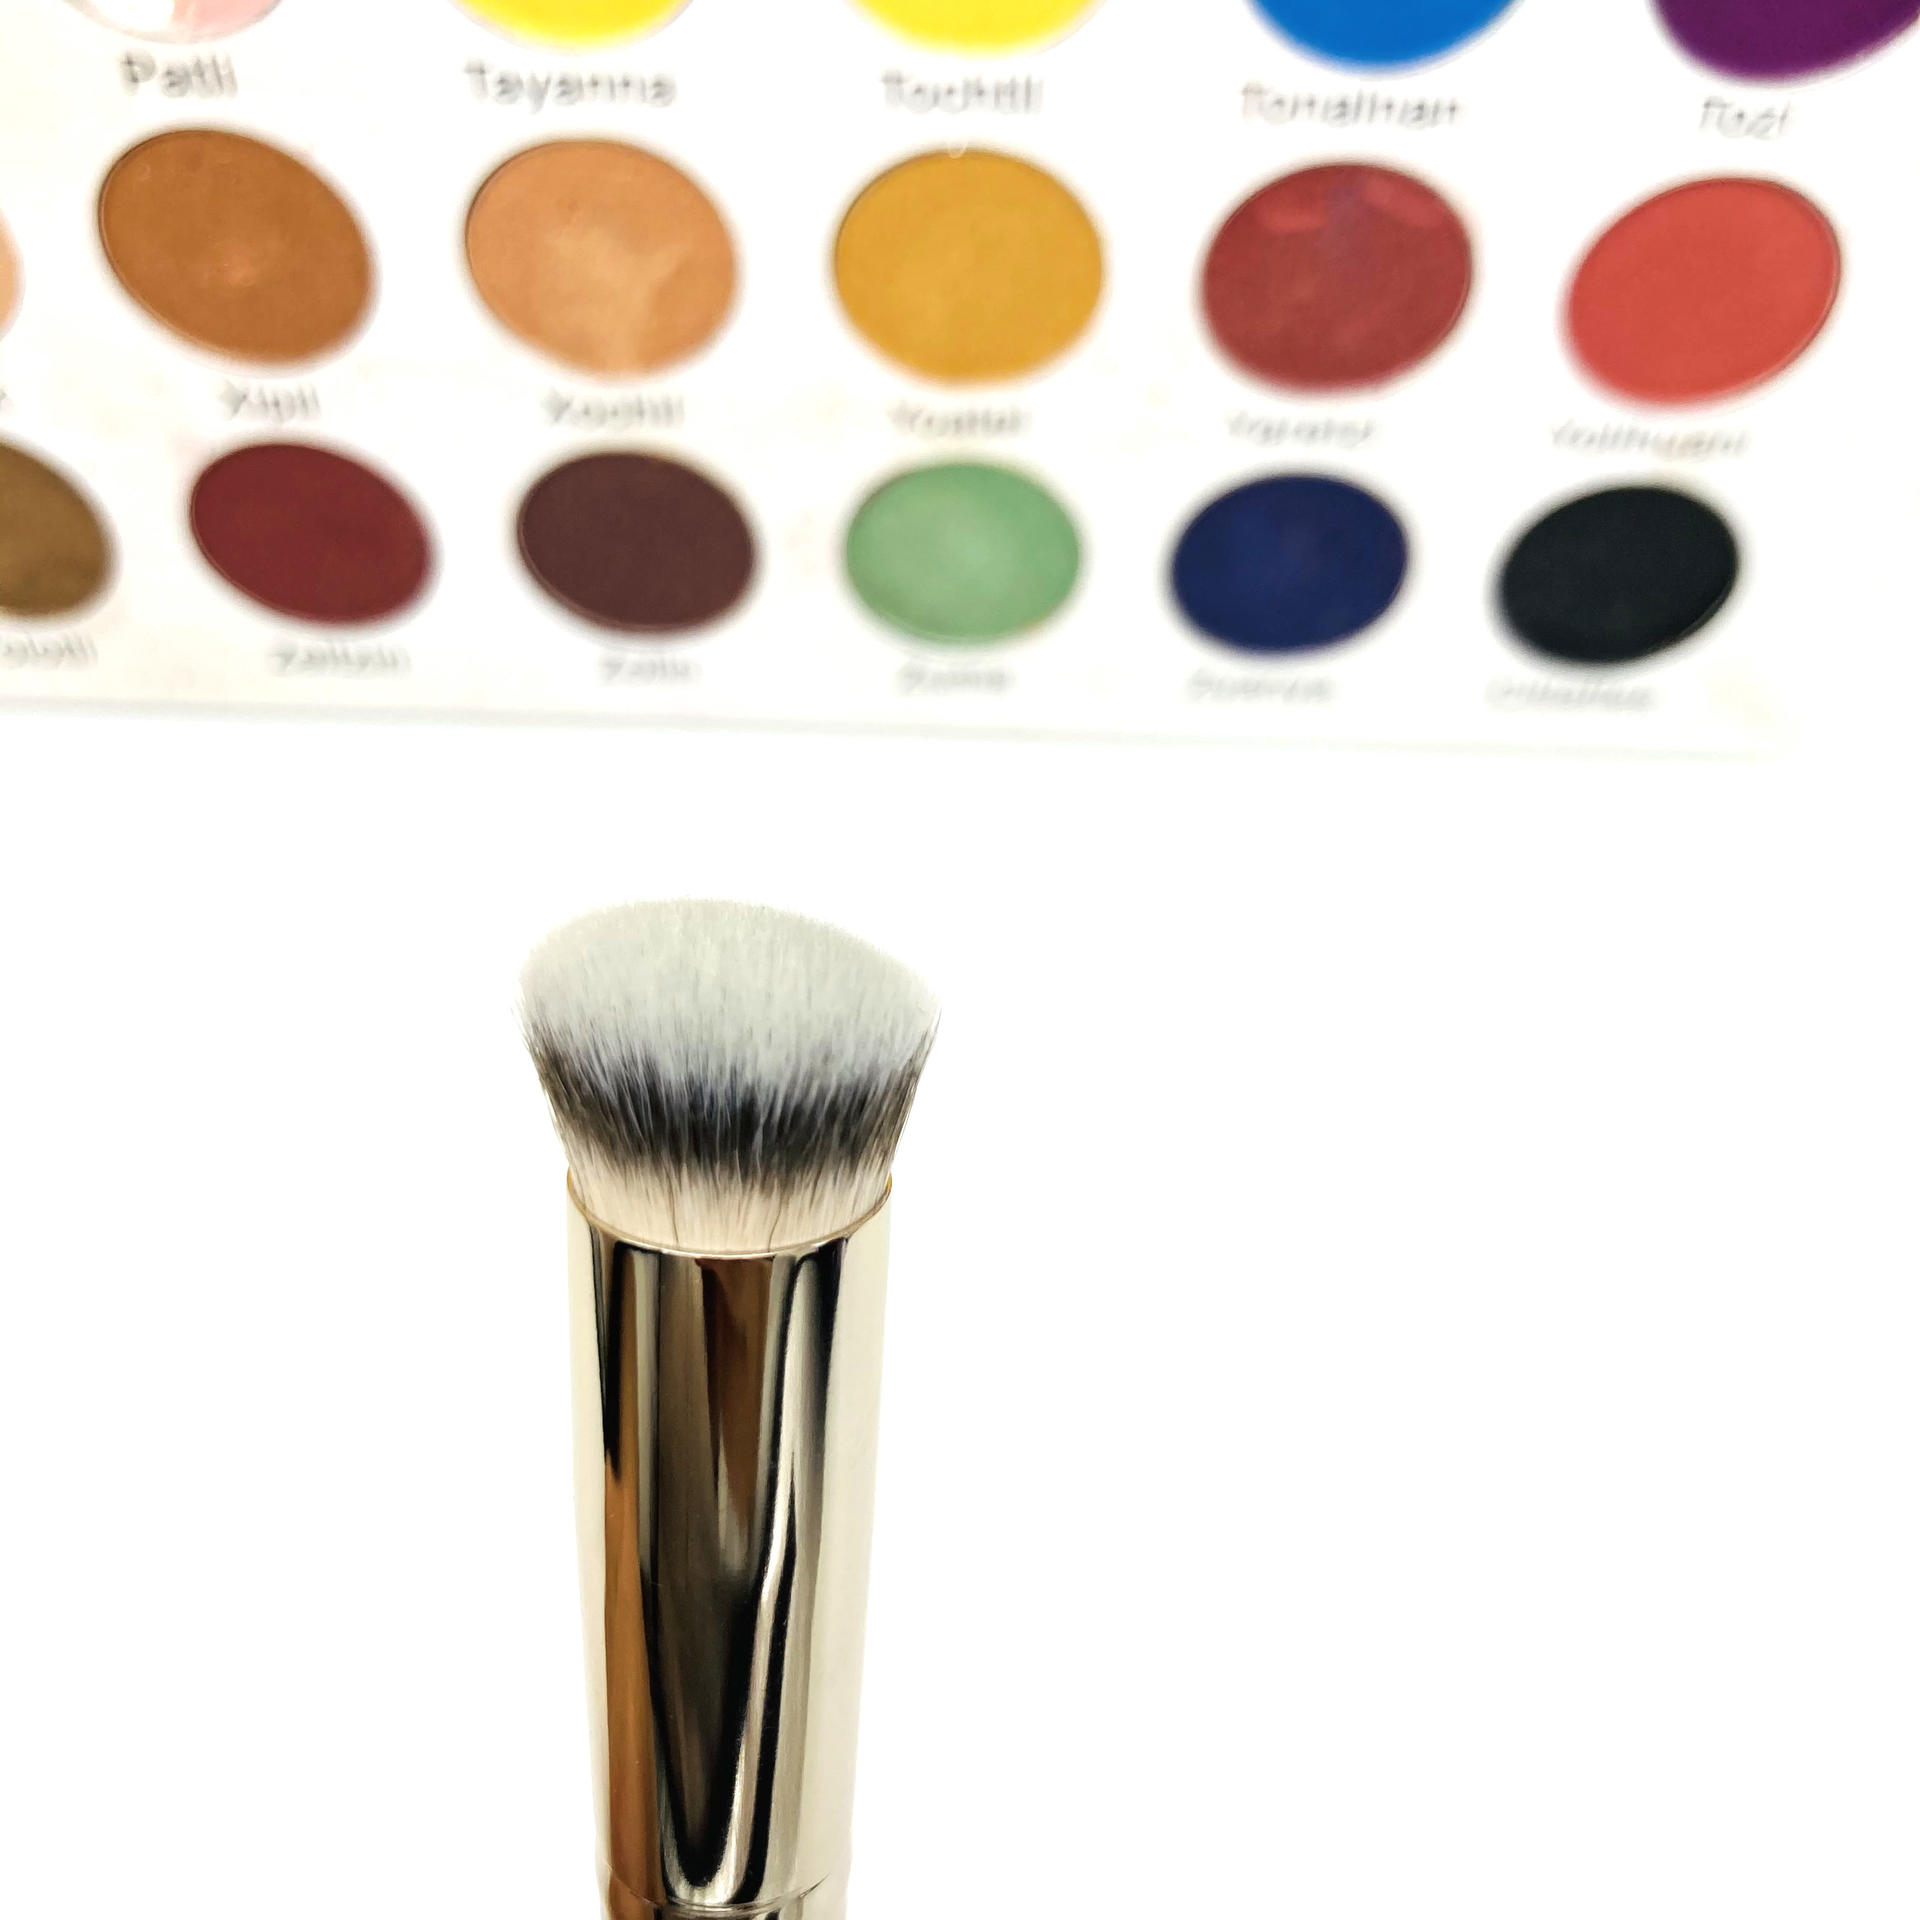 Professional Brush Makeup Synthetic Hair Private Label Vegan Makeup Brush Cruelty Free Single Foundation Concealer Makeup Brush